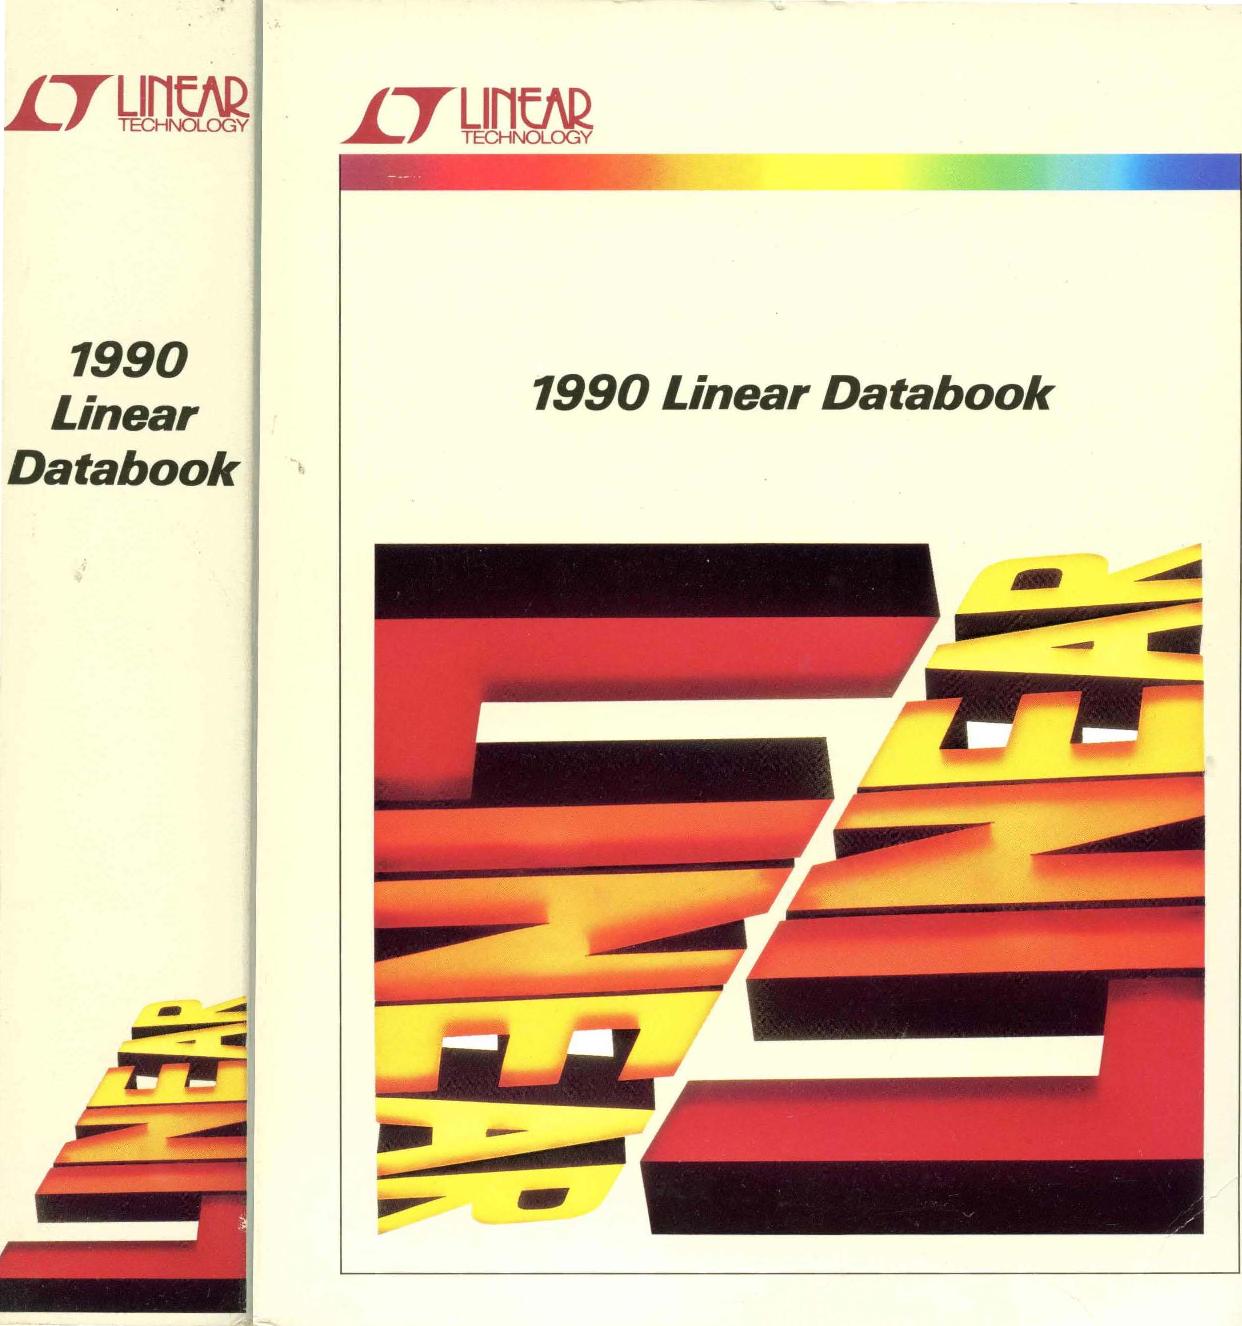 1990_Linear_Databook 1990 Linear Databook